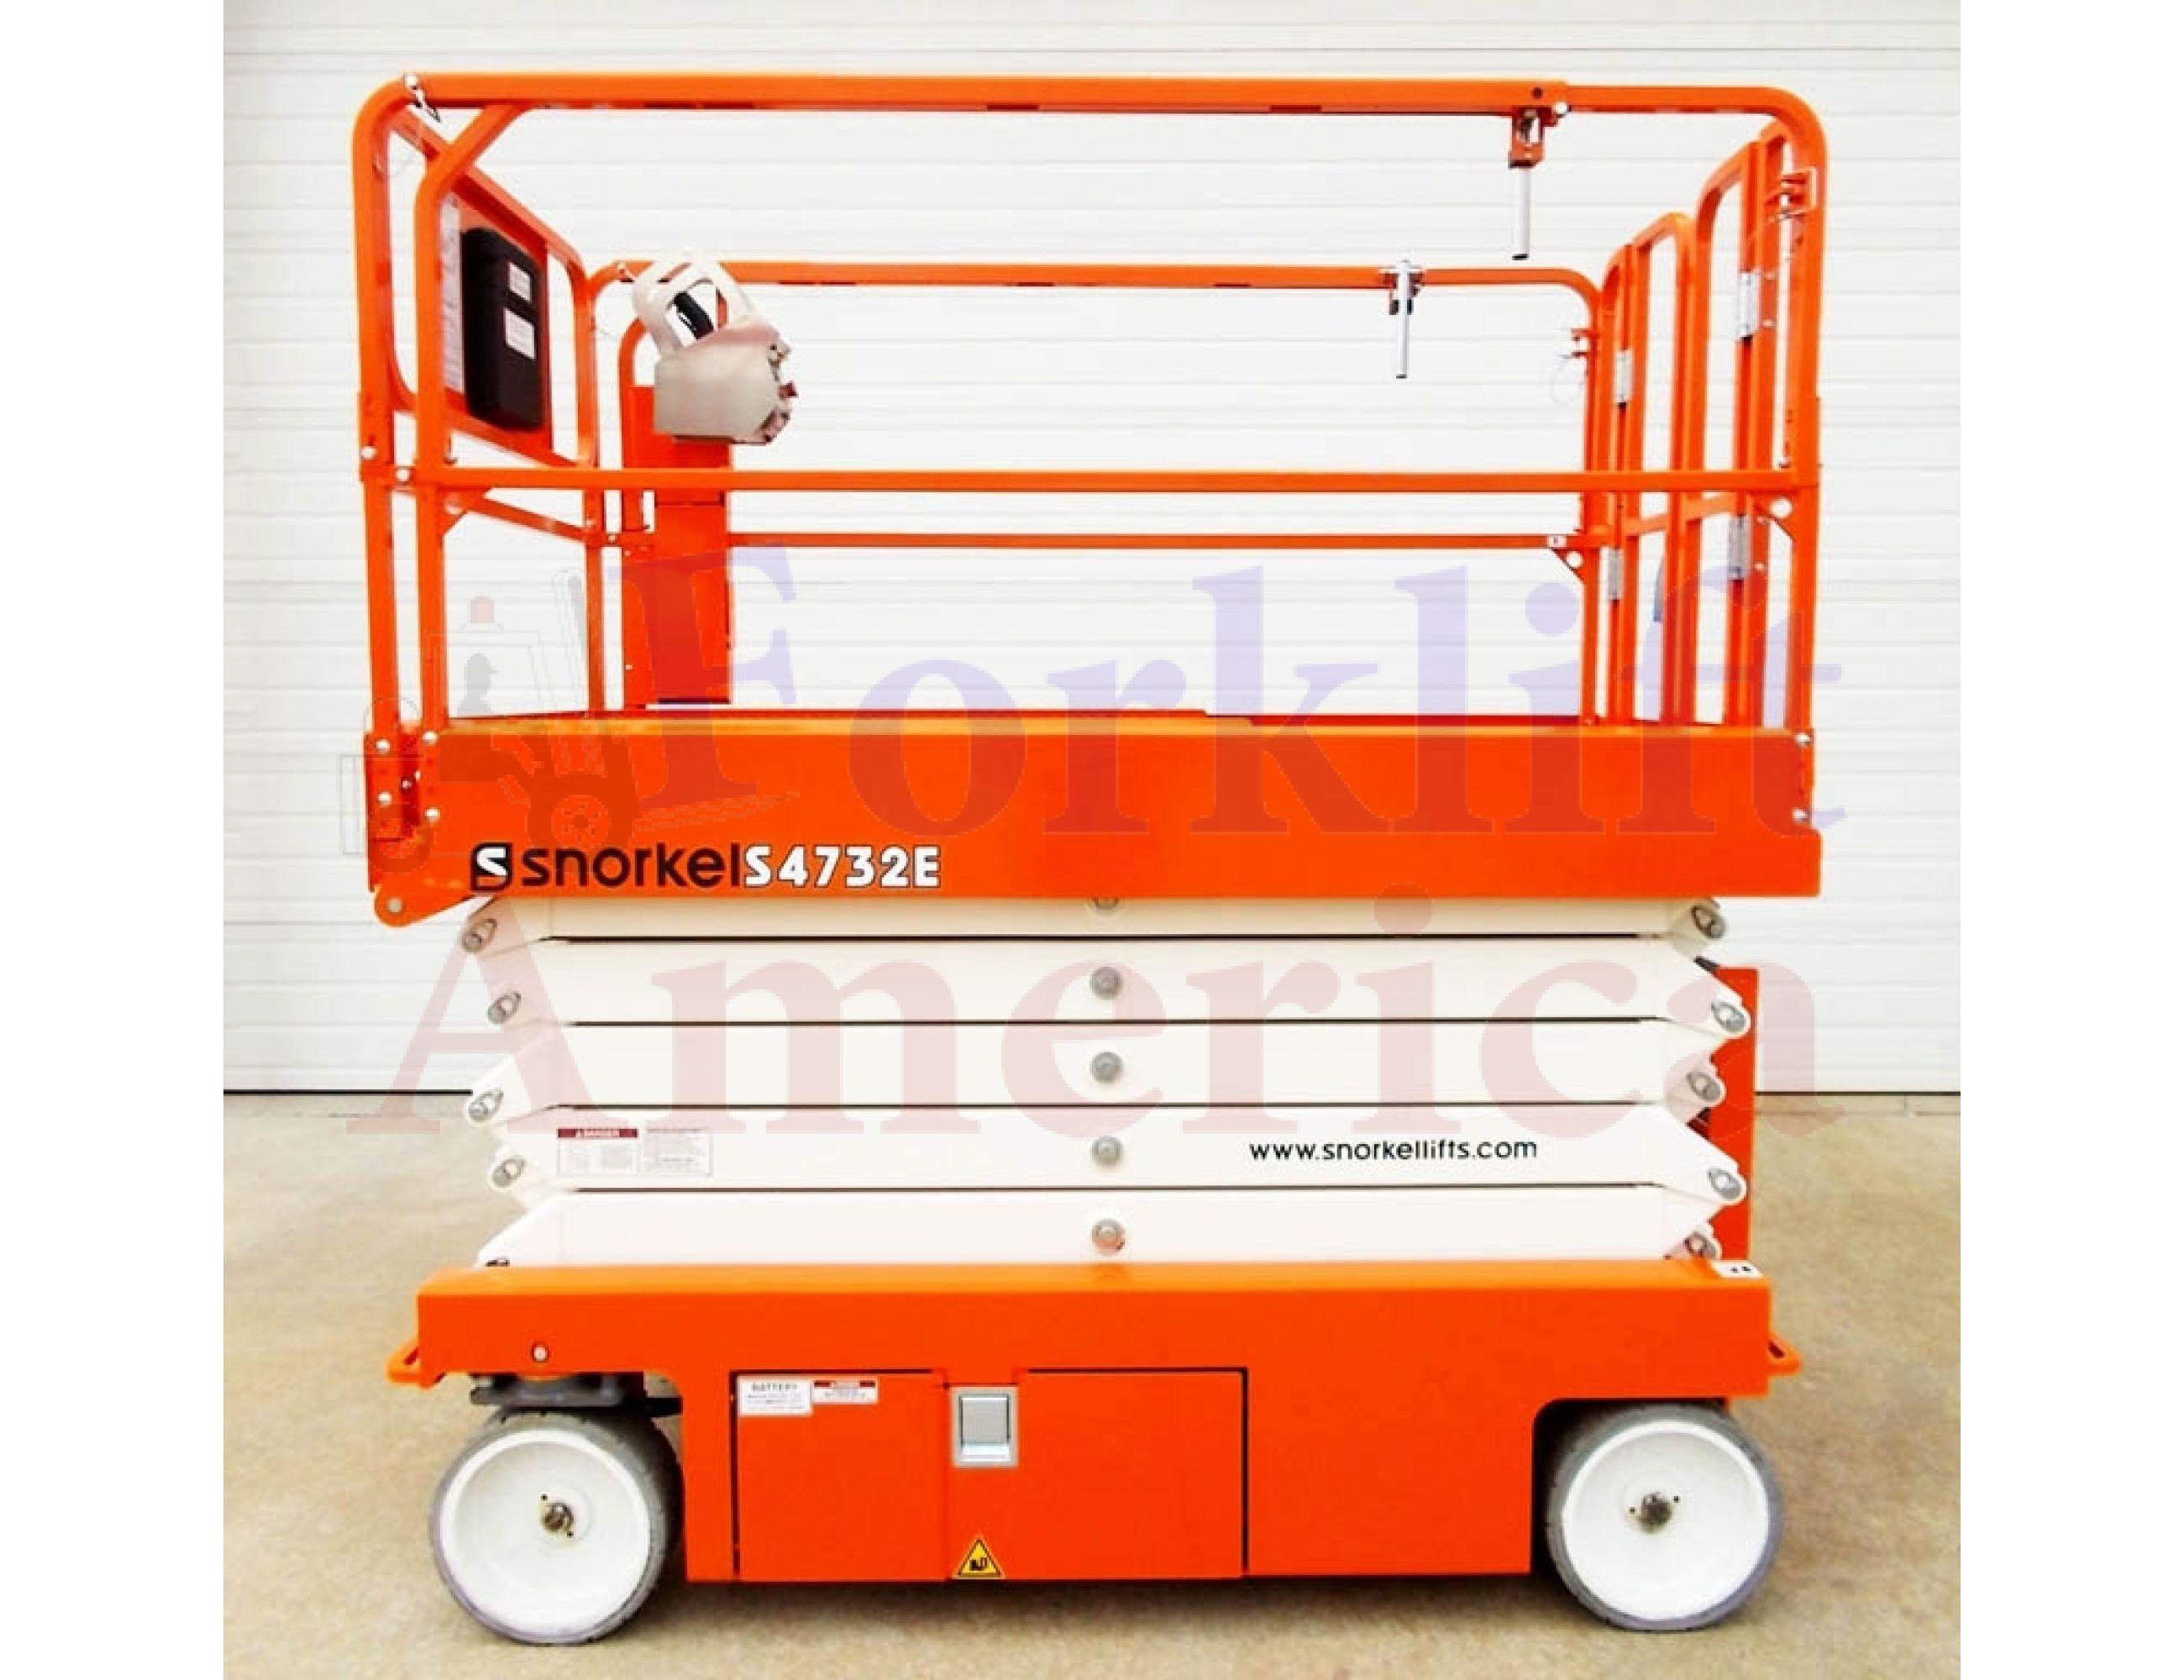 Snorkel S4732E Hydraulic Drive Electric Scissor Lift